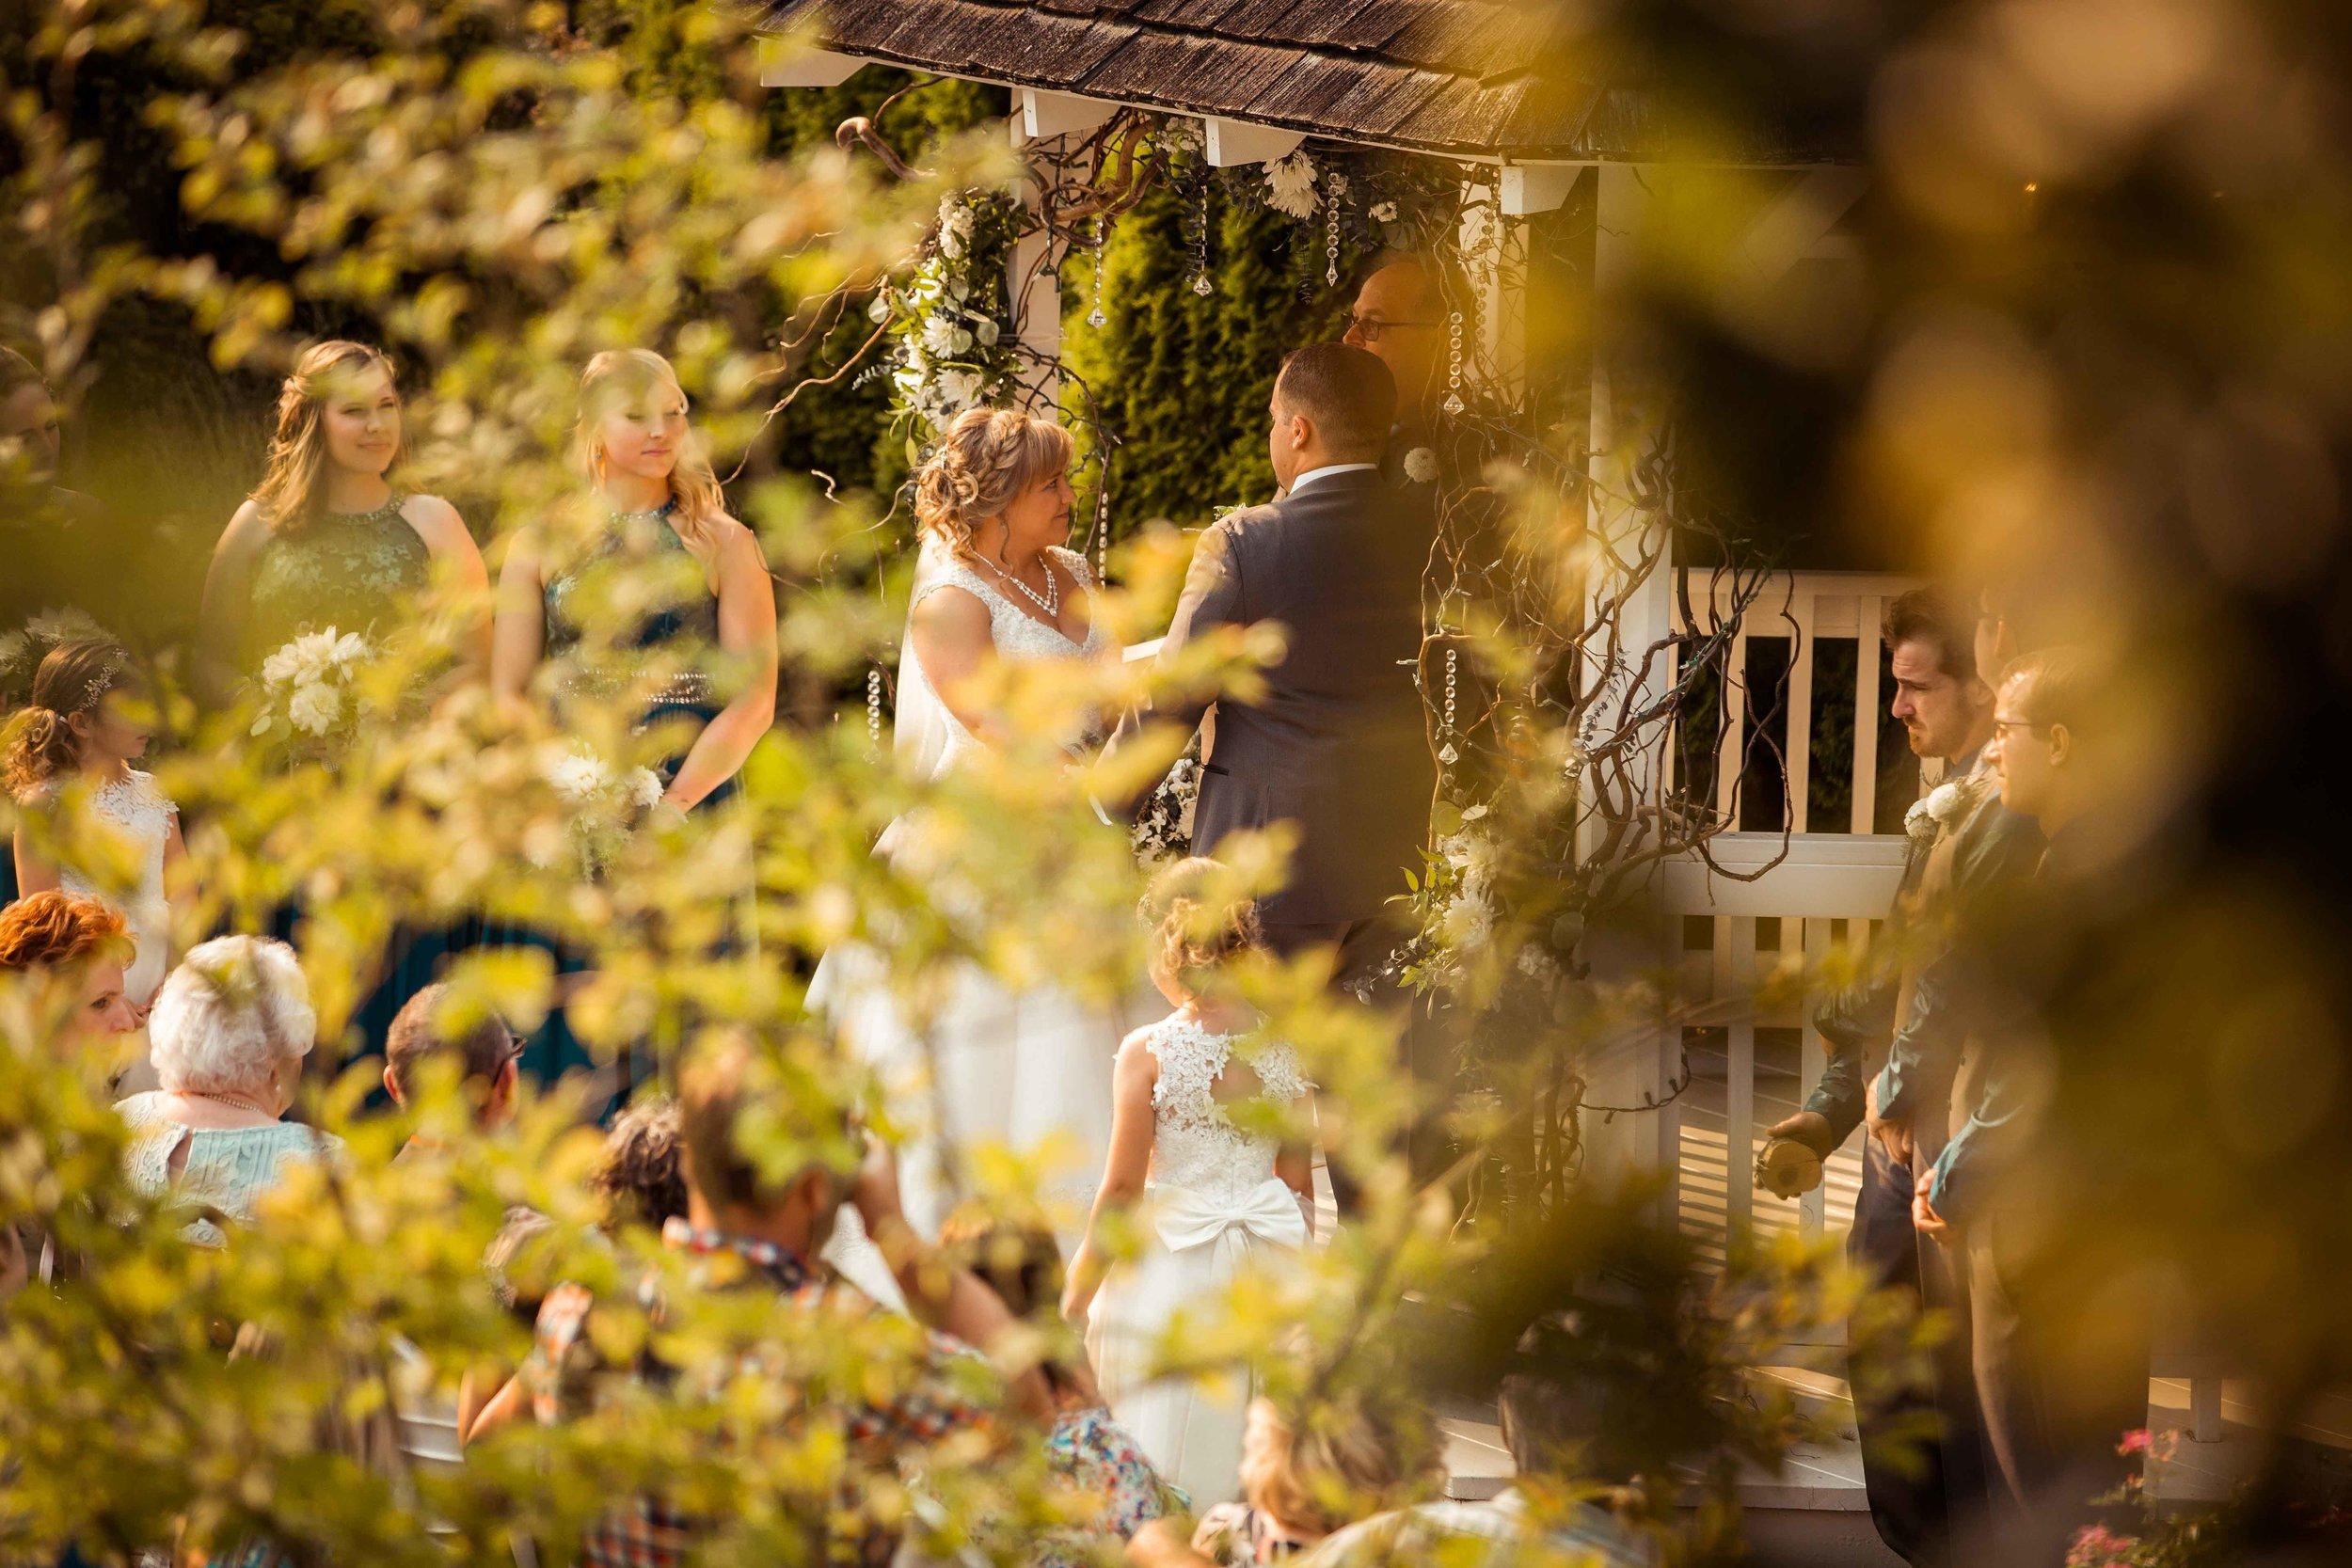 Ceremony Kaylee and Wyatt - Dillon Vibes Photography-1.jpg